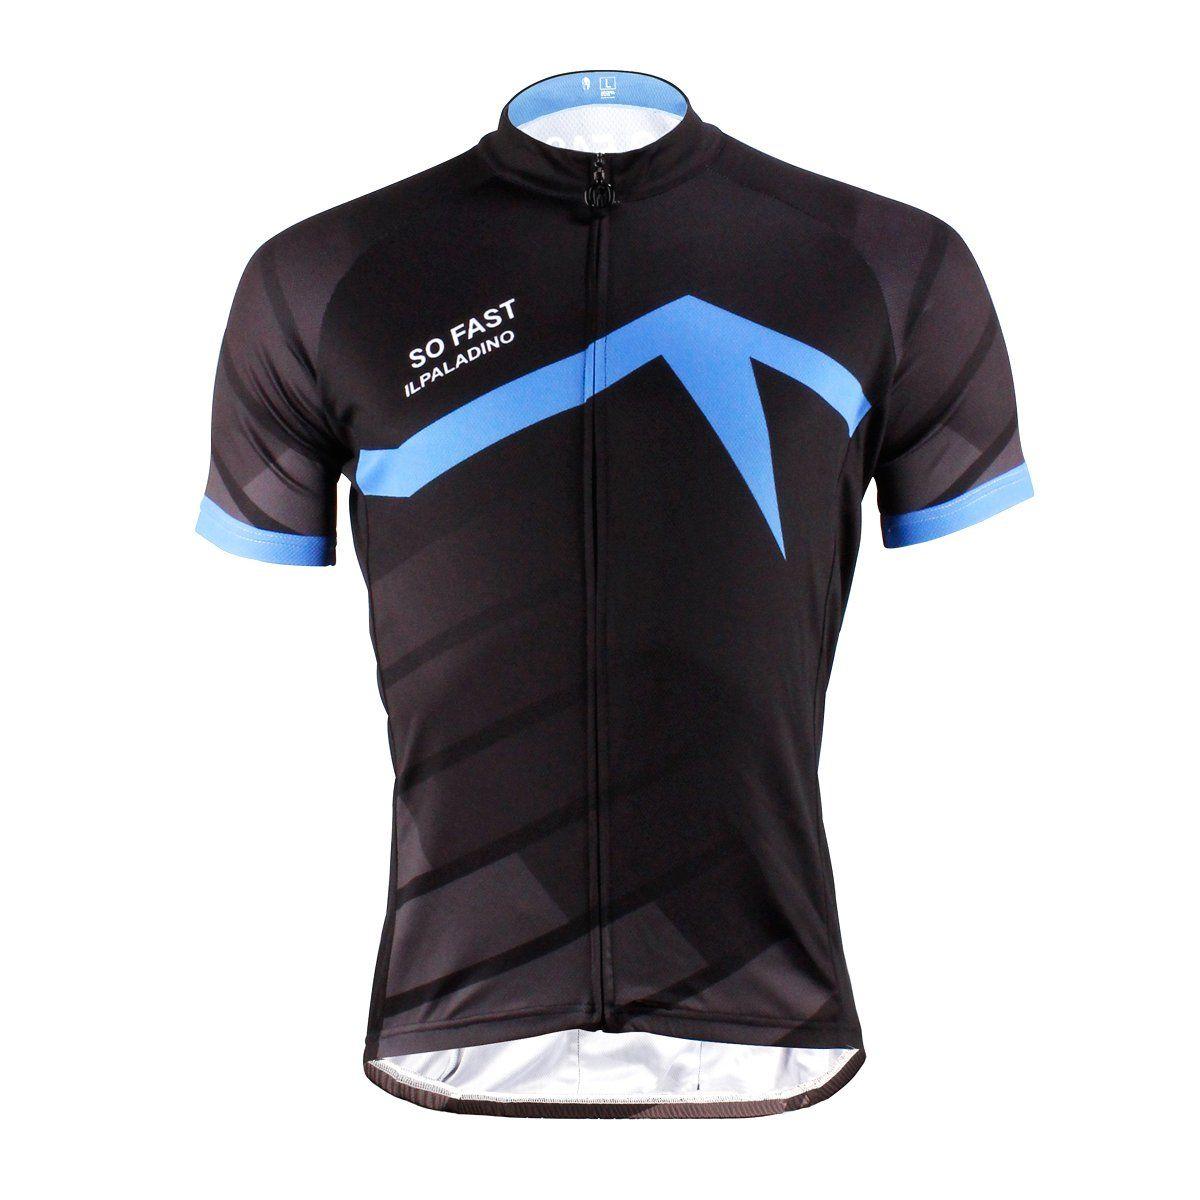 Cycling Jersey Mens Cycling Clothing Bike Sports Apparel